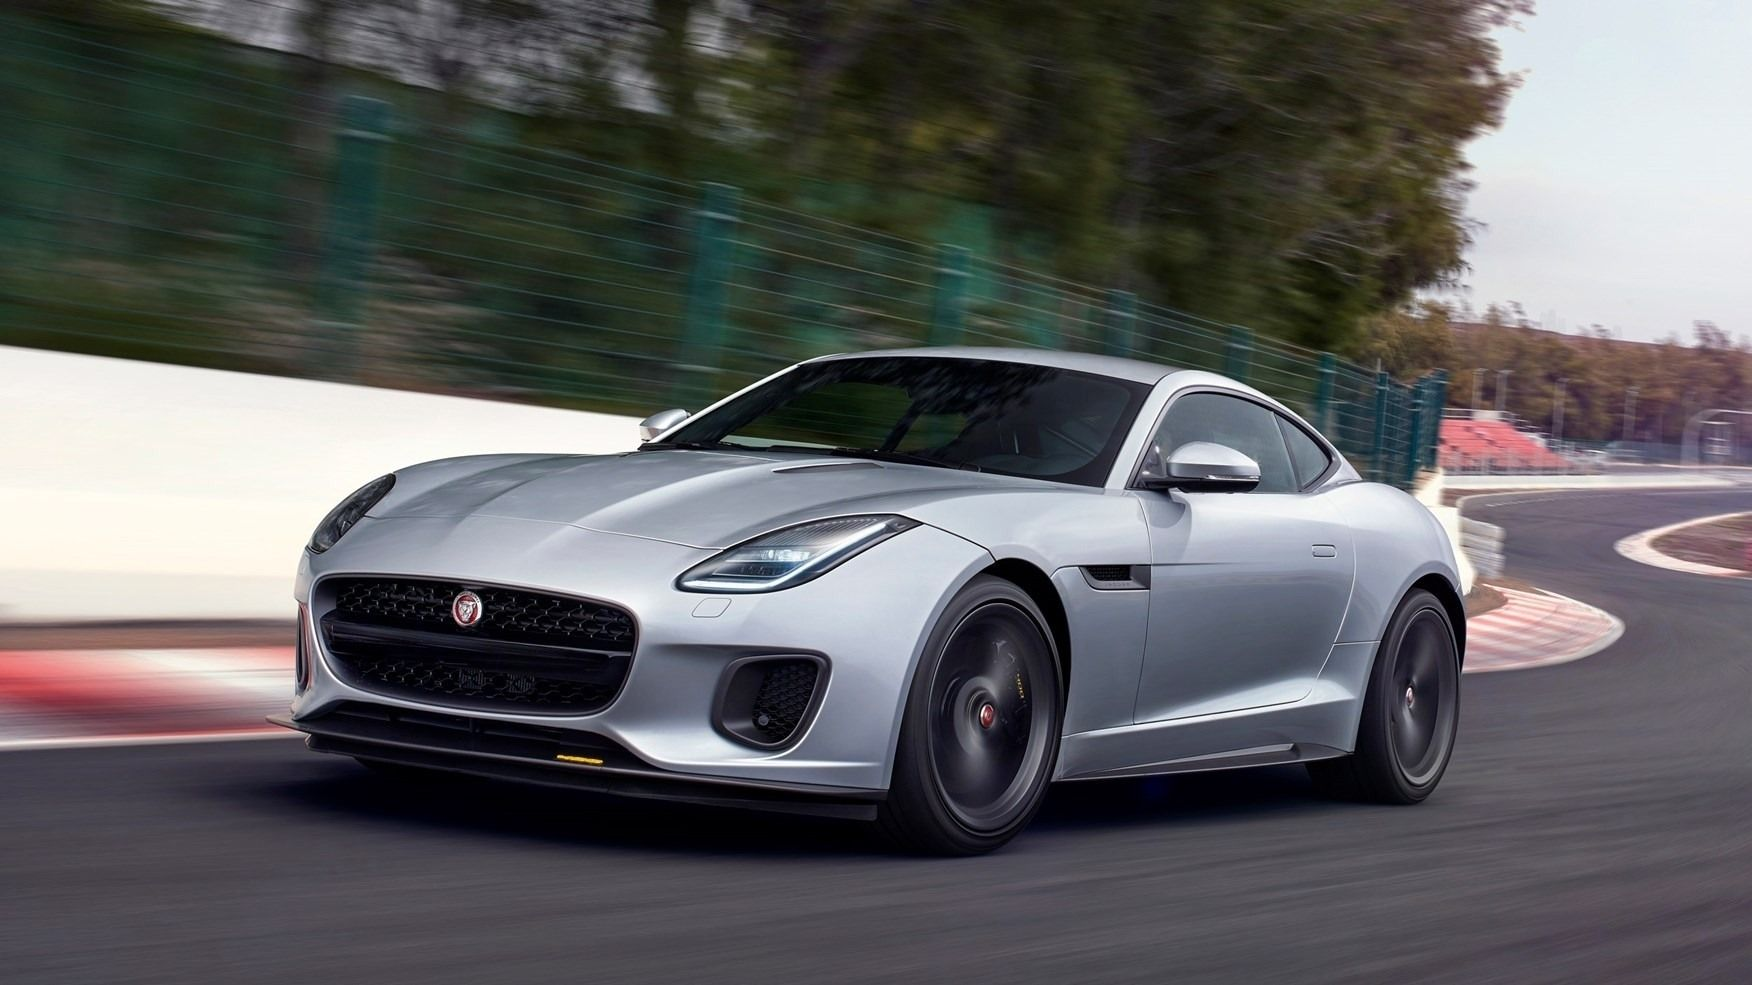 2019 Jaguar F Type R Awd Specs And Review Jaguar F Type Supercars Jaguar